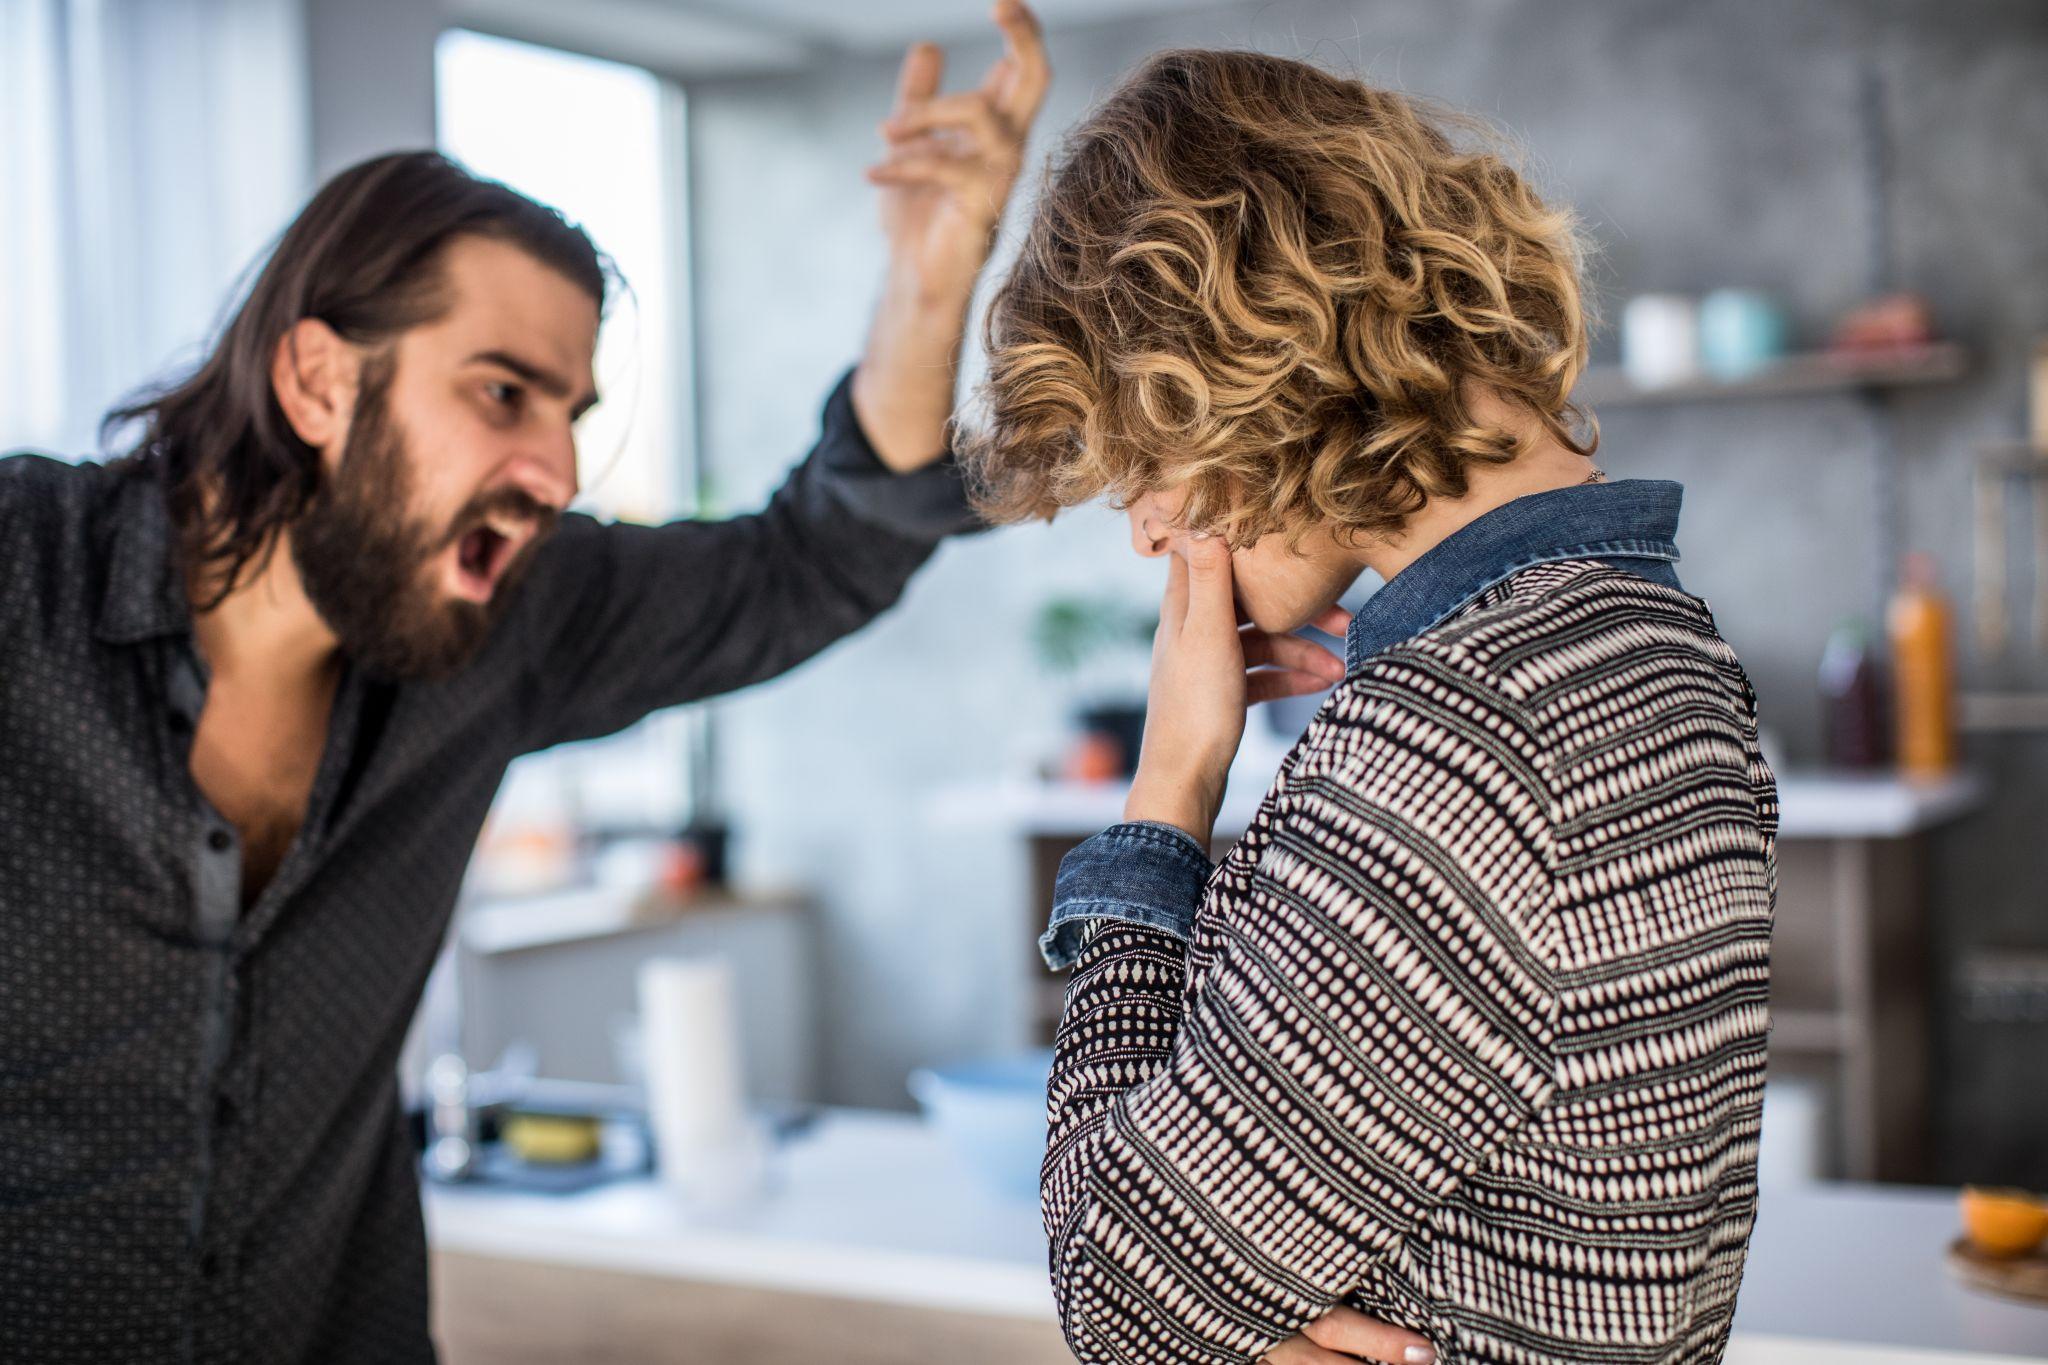 Dear Abby: Seek help about abusive husband